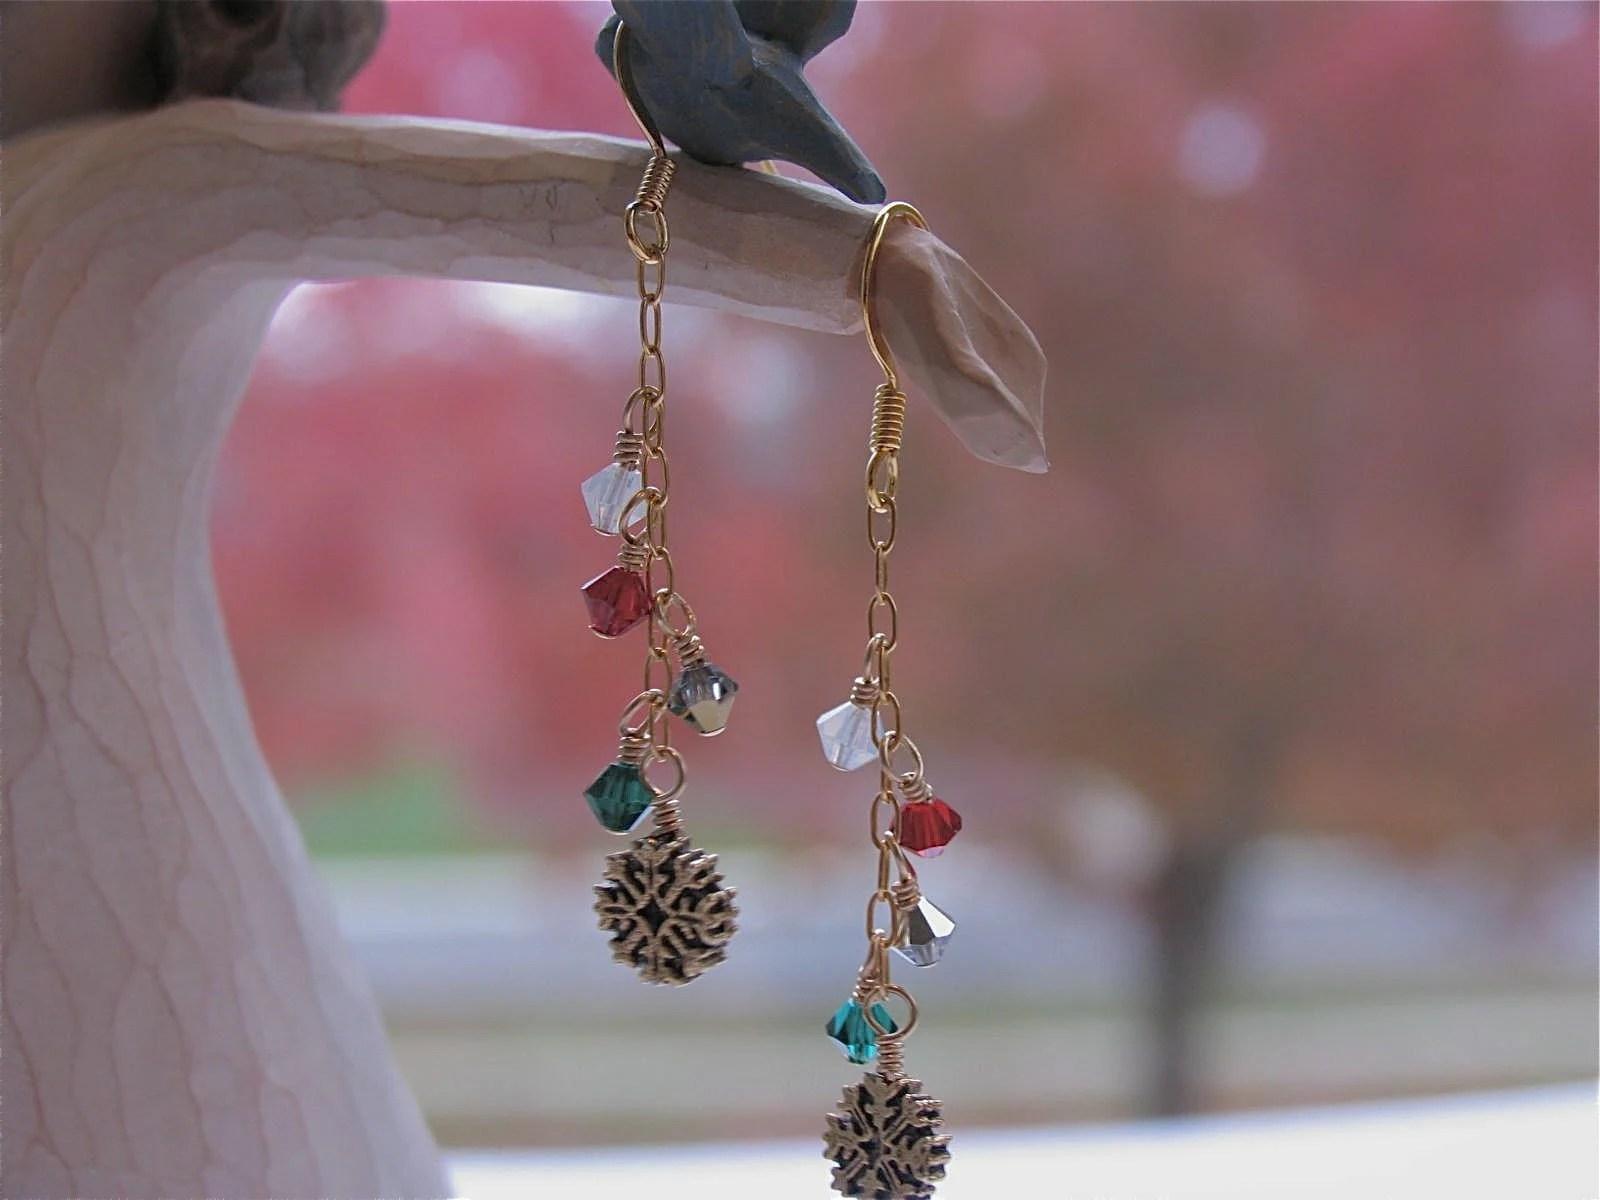 Snowflake Christmas Holiday earrings by NewelryJewelry